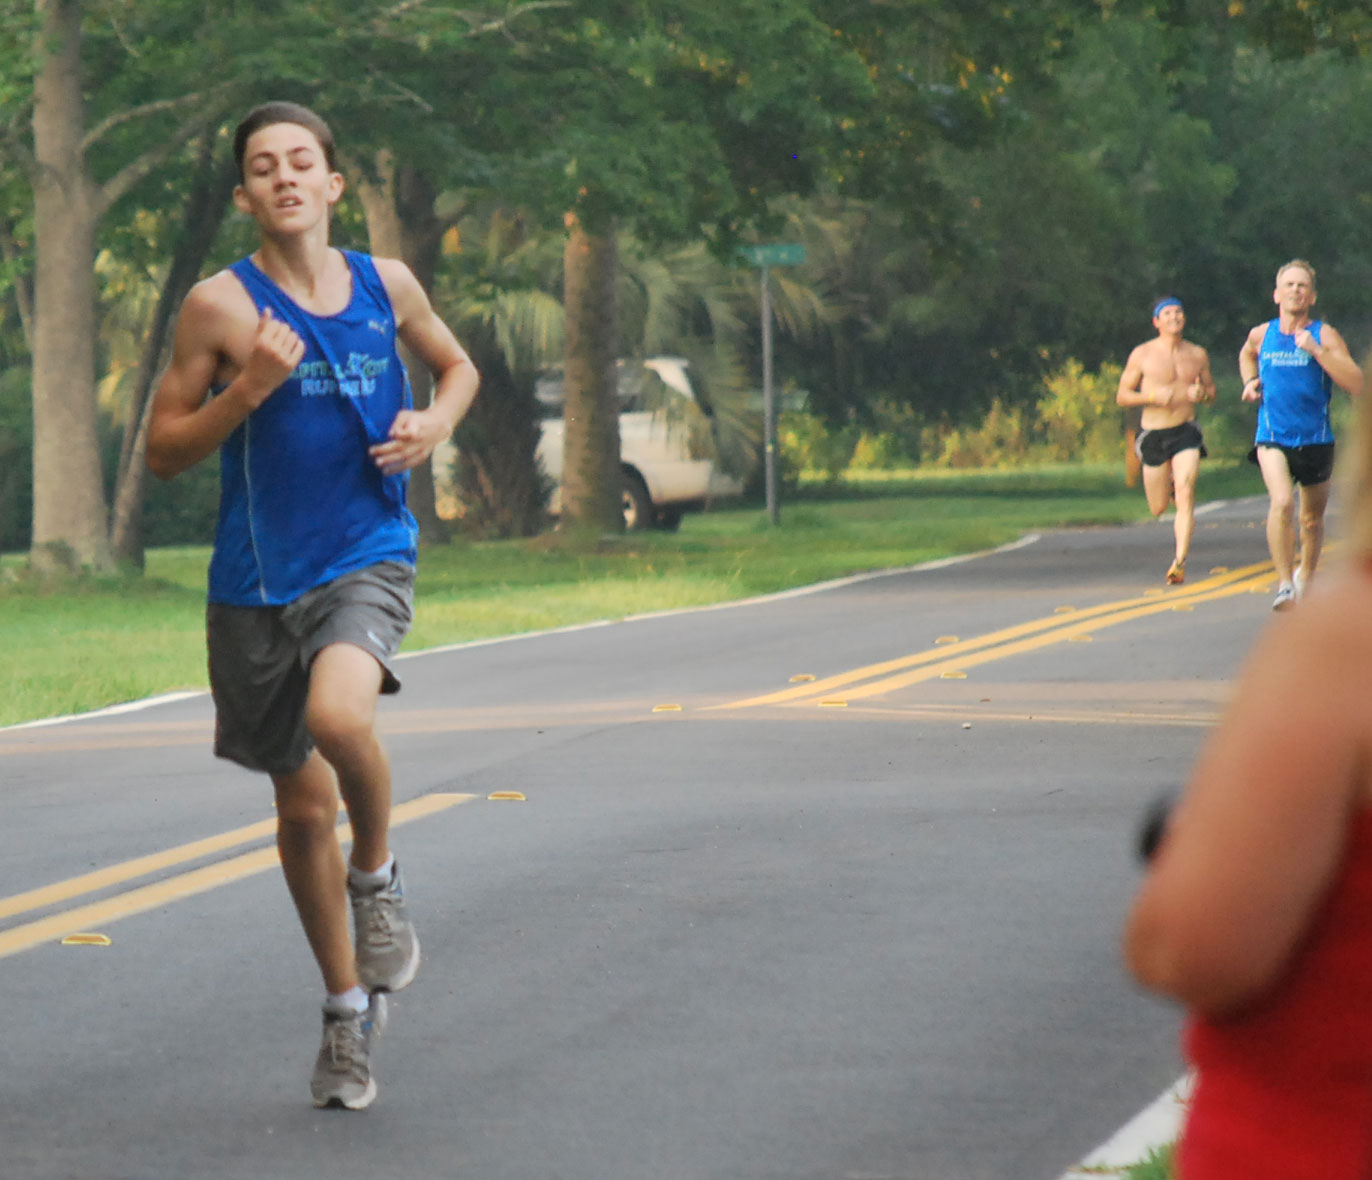 ... Running Blog: Independence Day Firecracker 5000 in Greensboro, Georgia